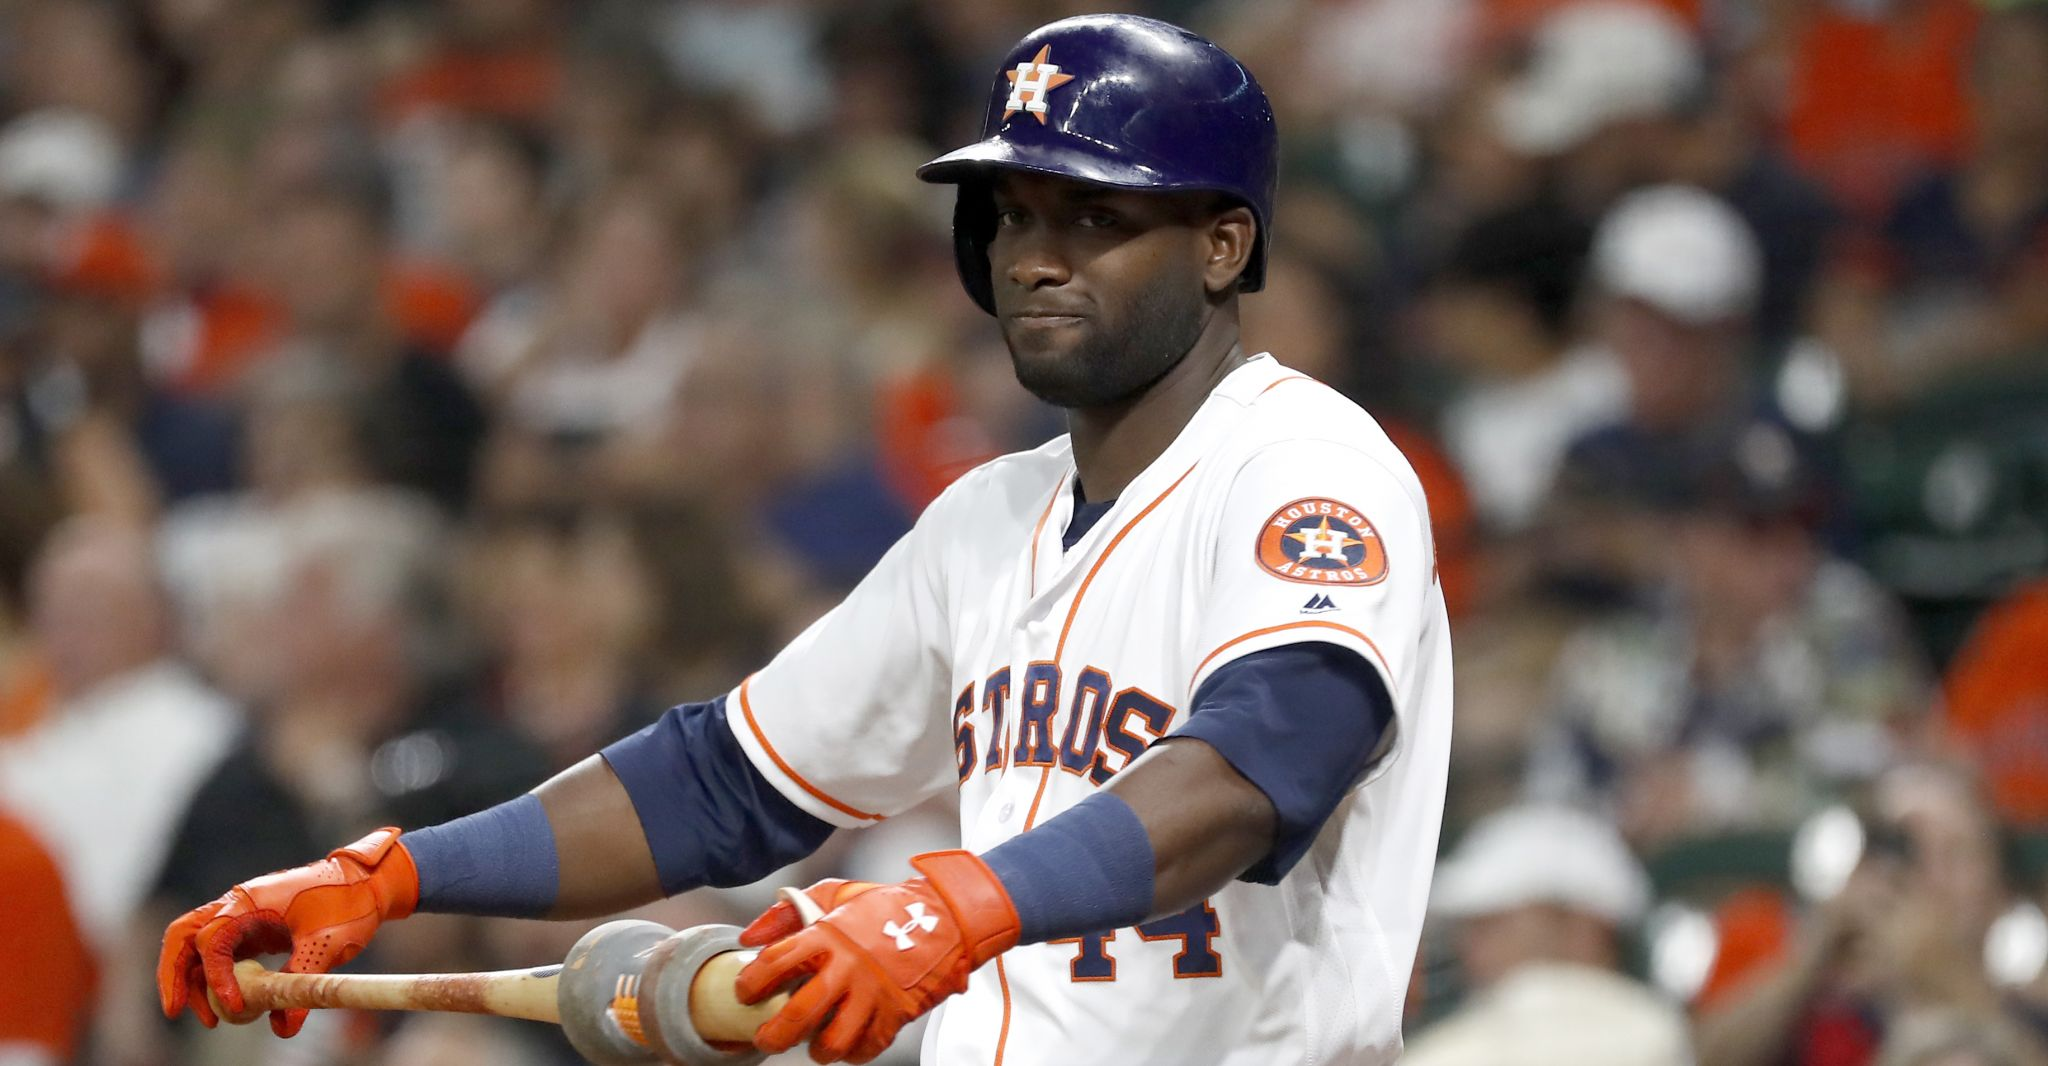 Astros insider: Yordan Álvarez is 'above and beyond'